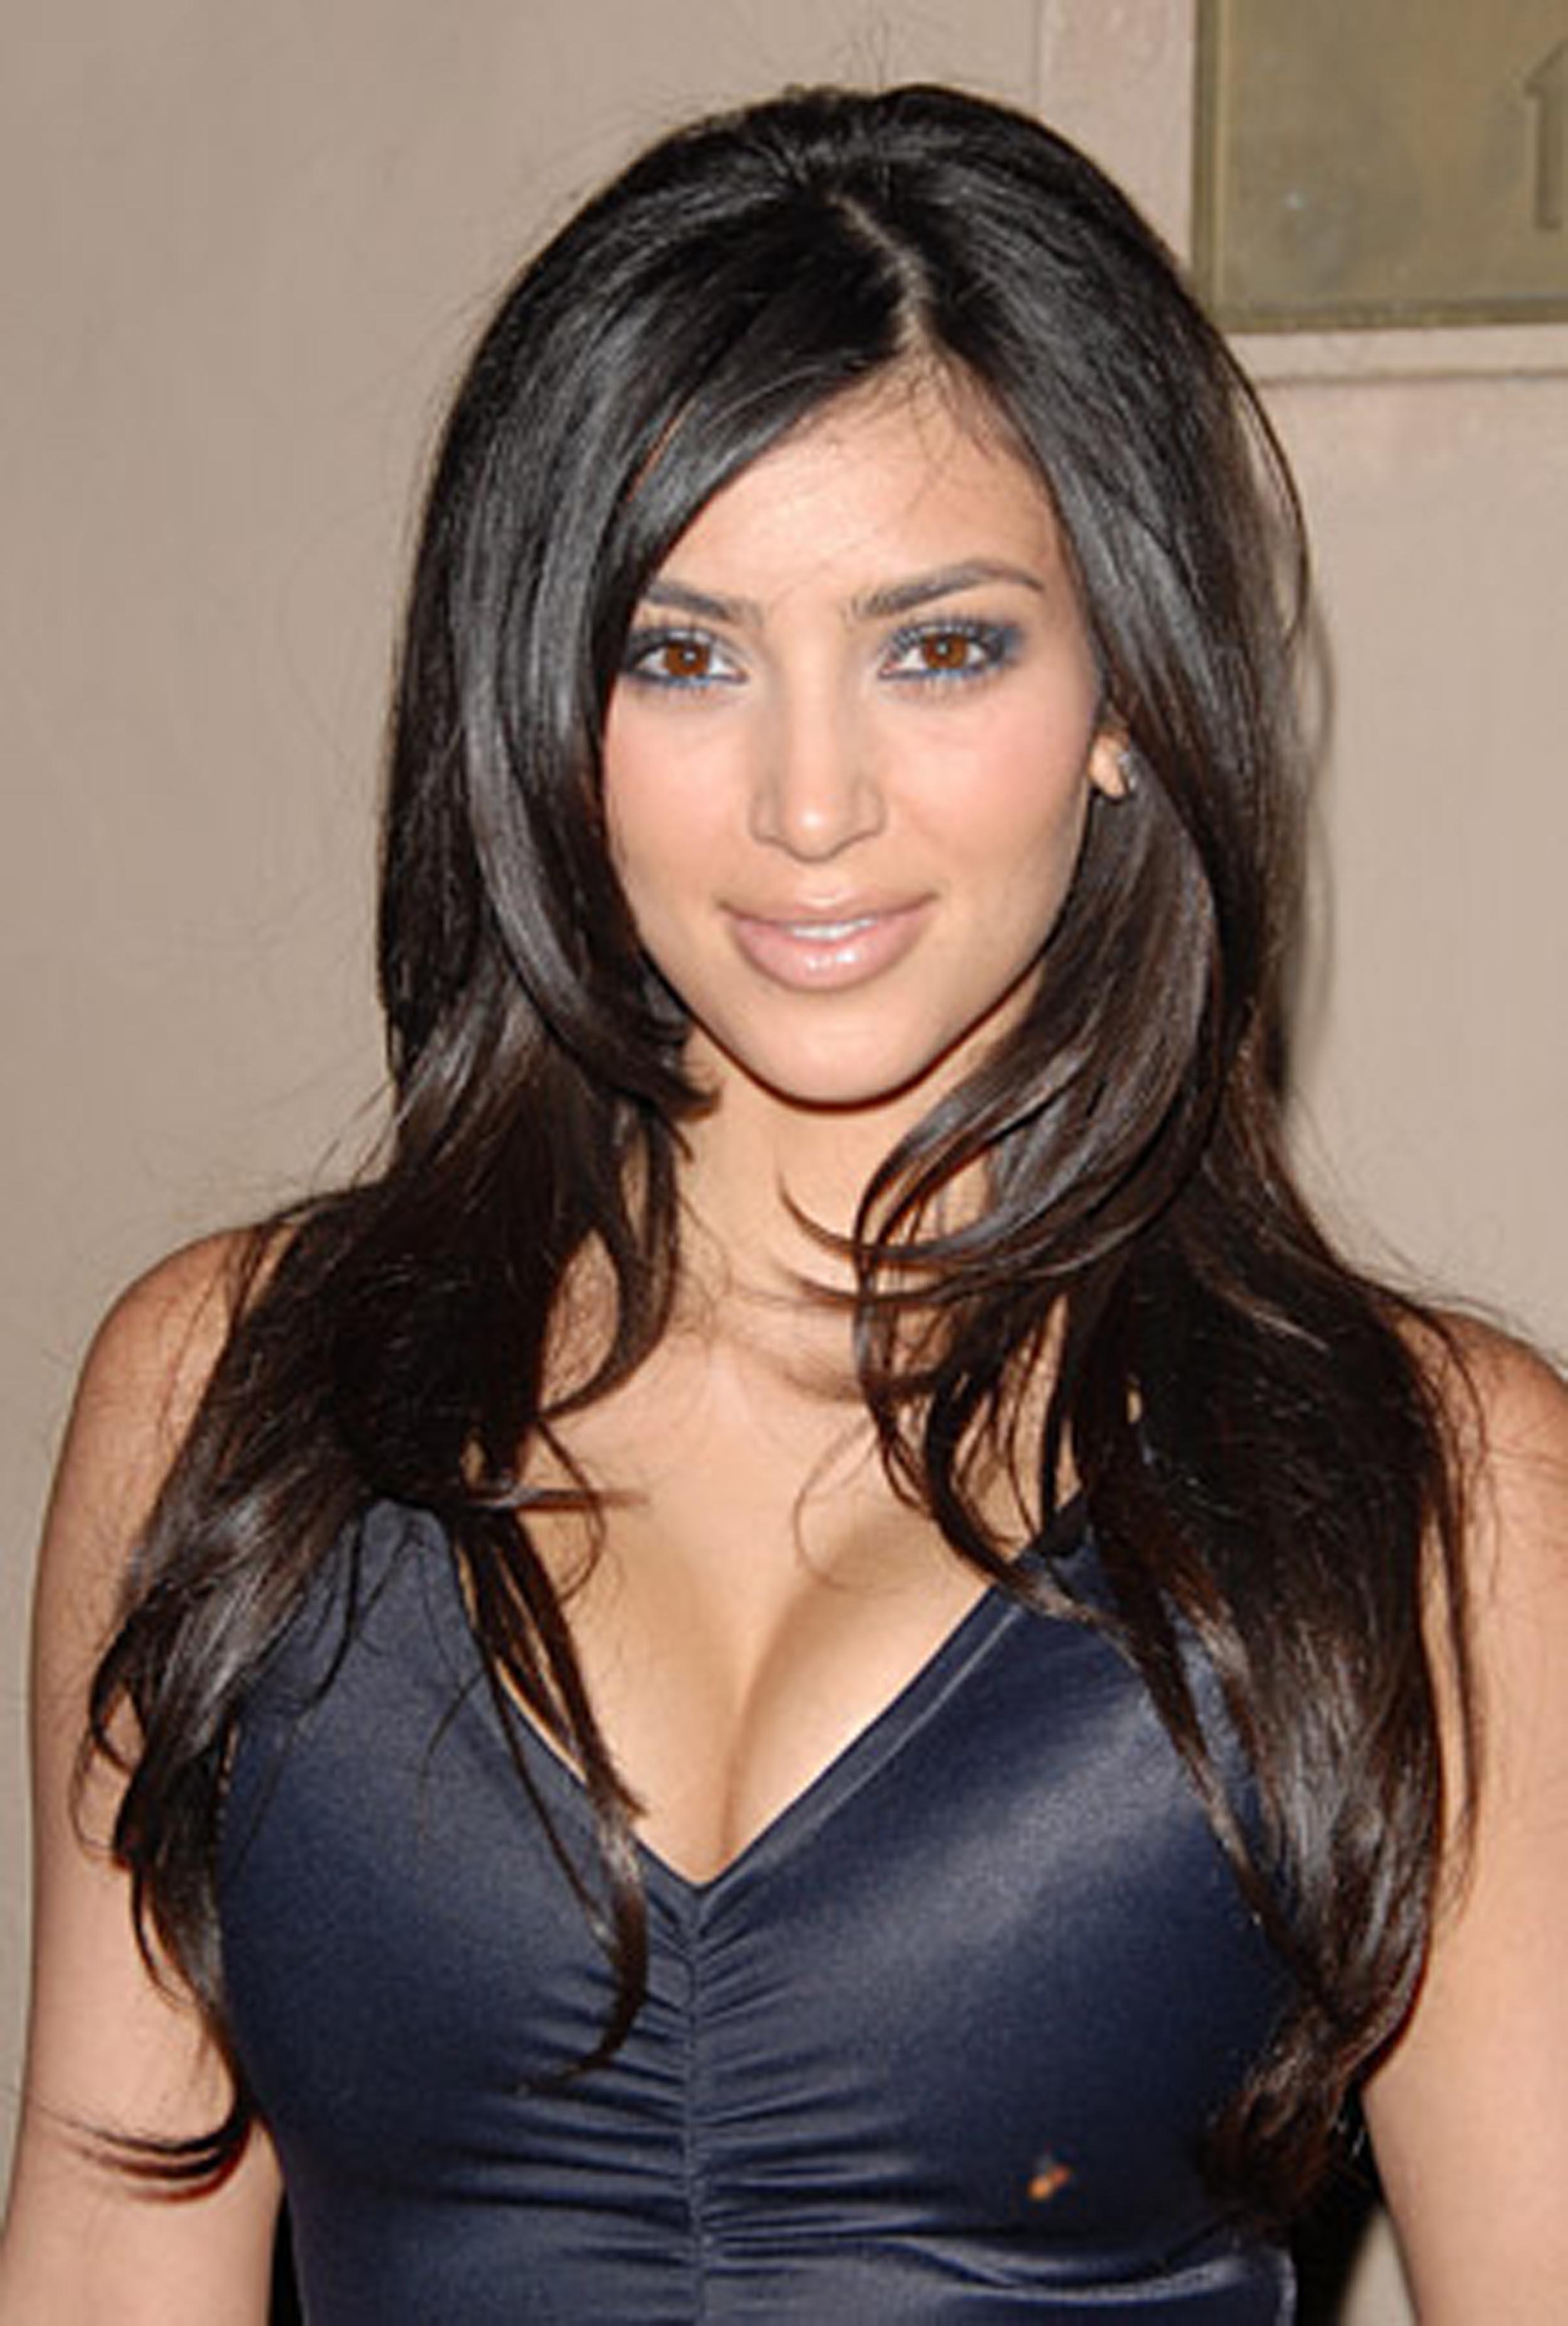 kim-kardashian-volume-hairstyle